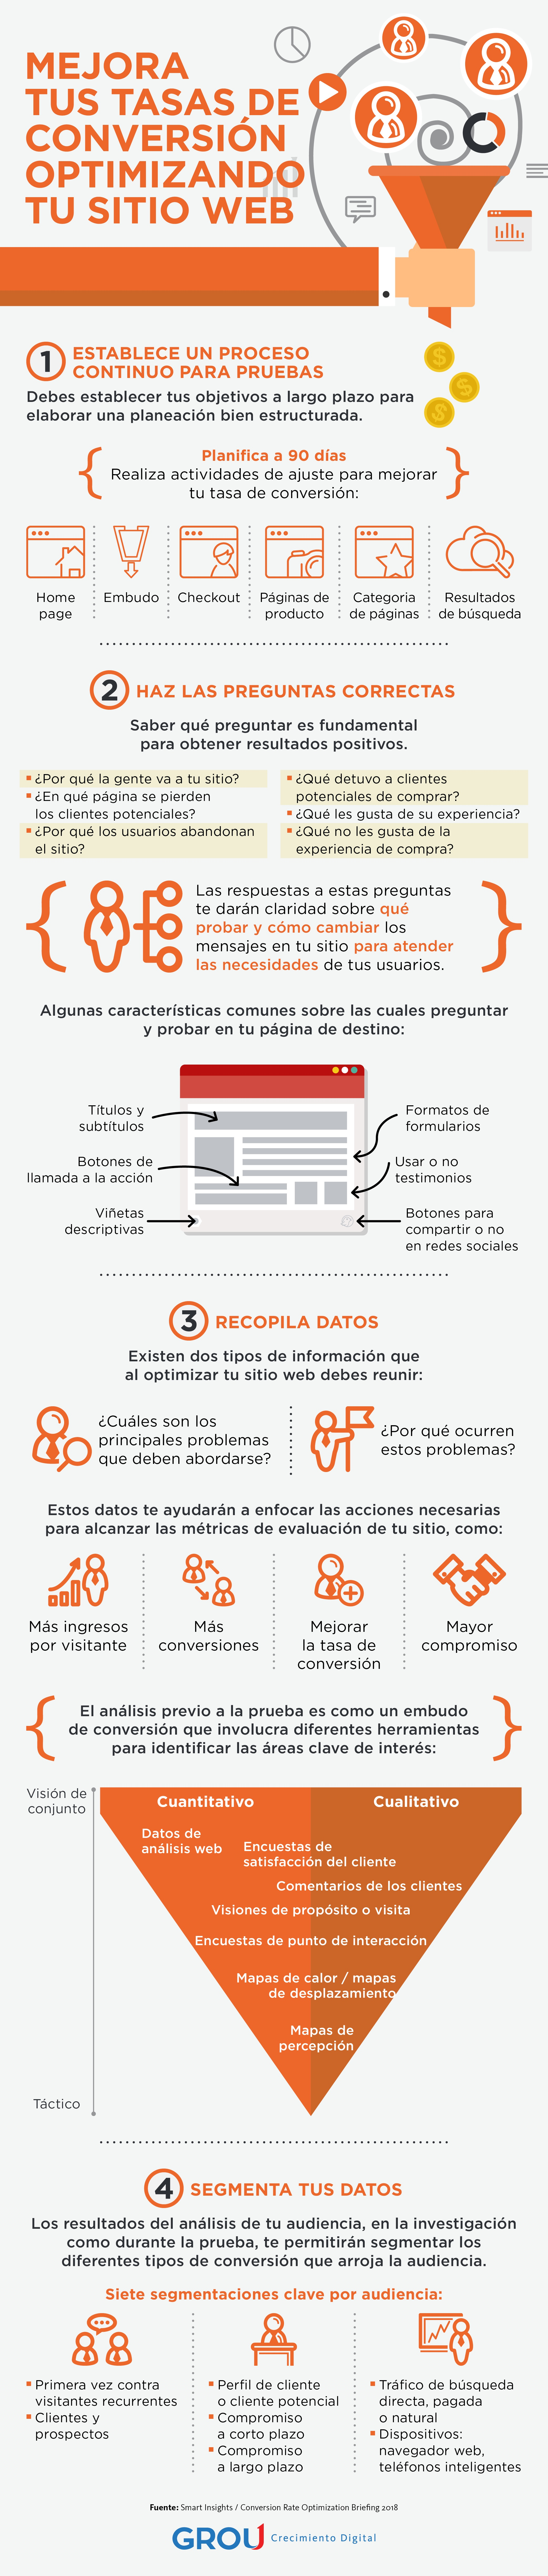 Infografia_24_julio_1_grou